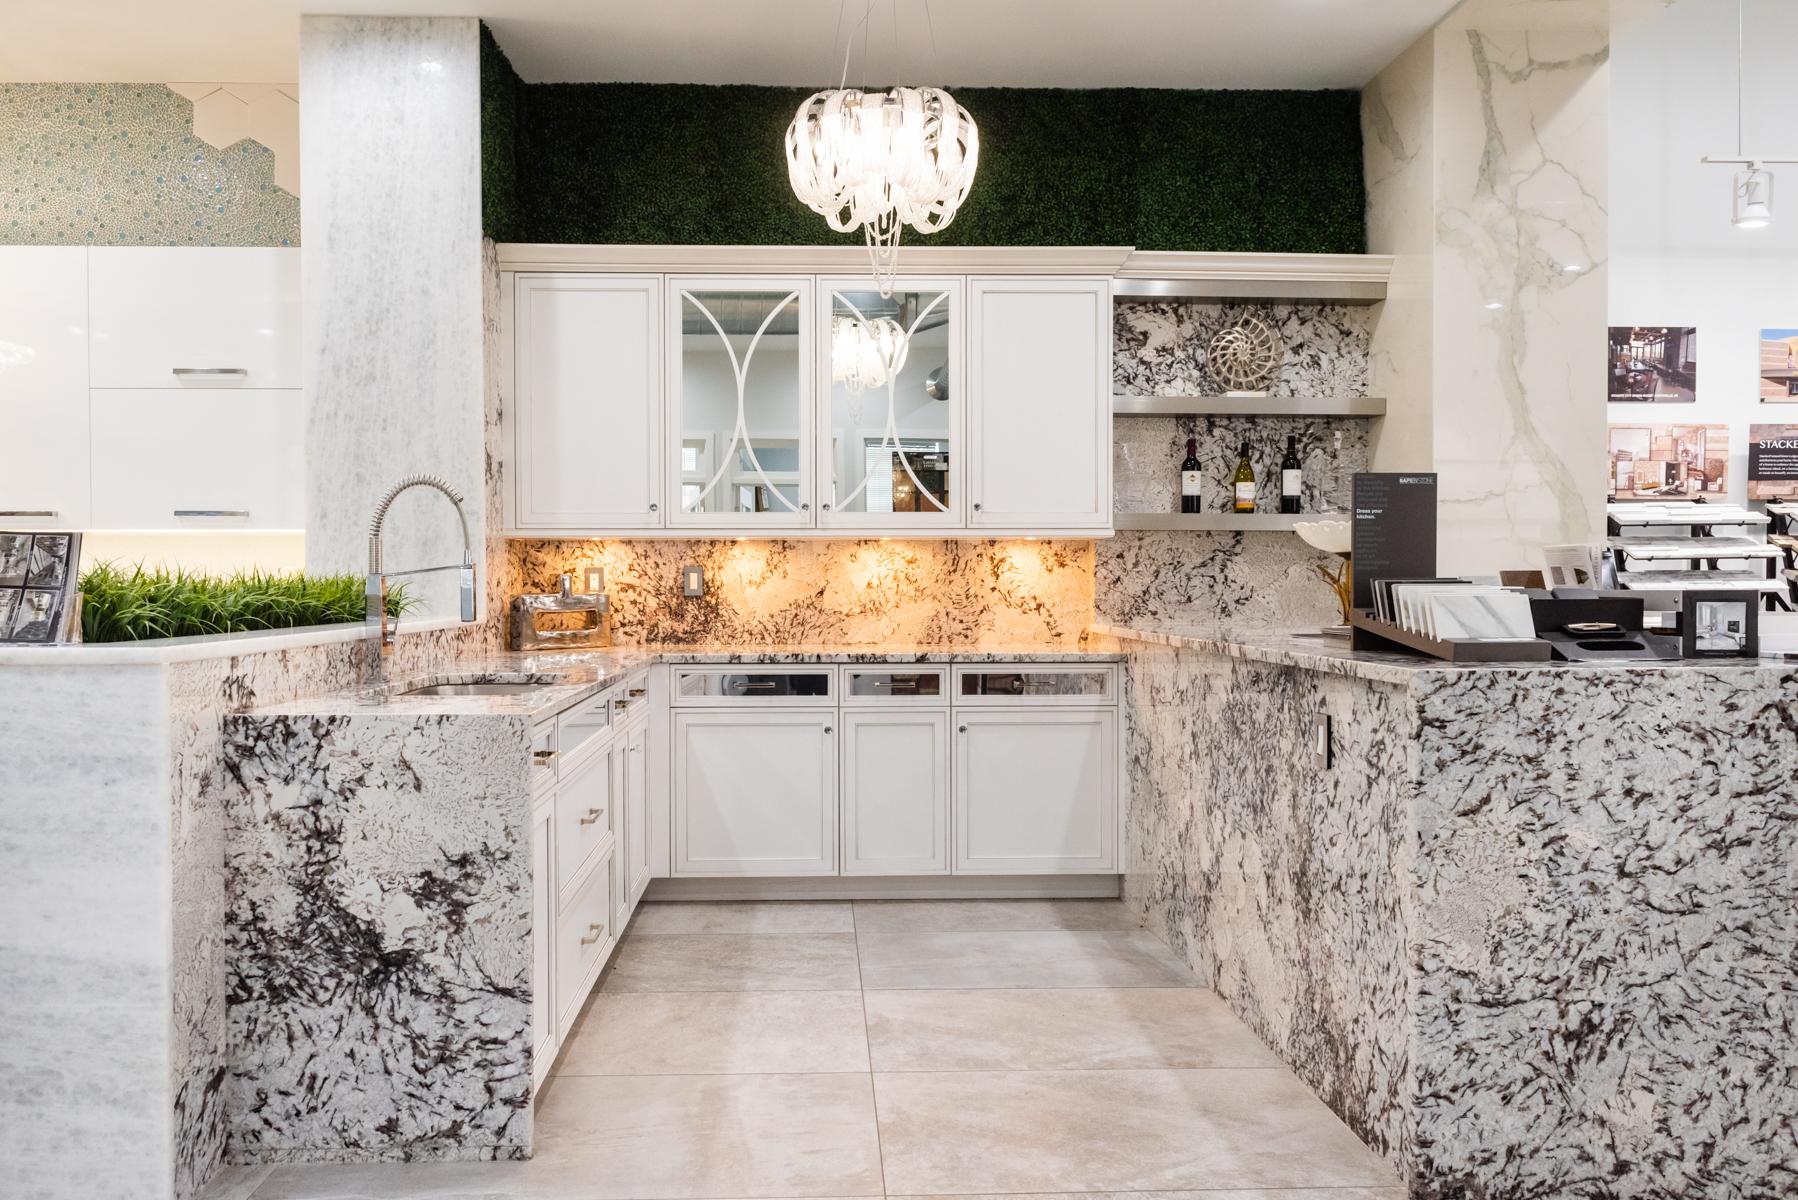 detroit s las vegas stone flooring opens new 6 000 square foot showroom steward media